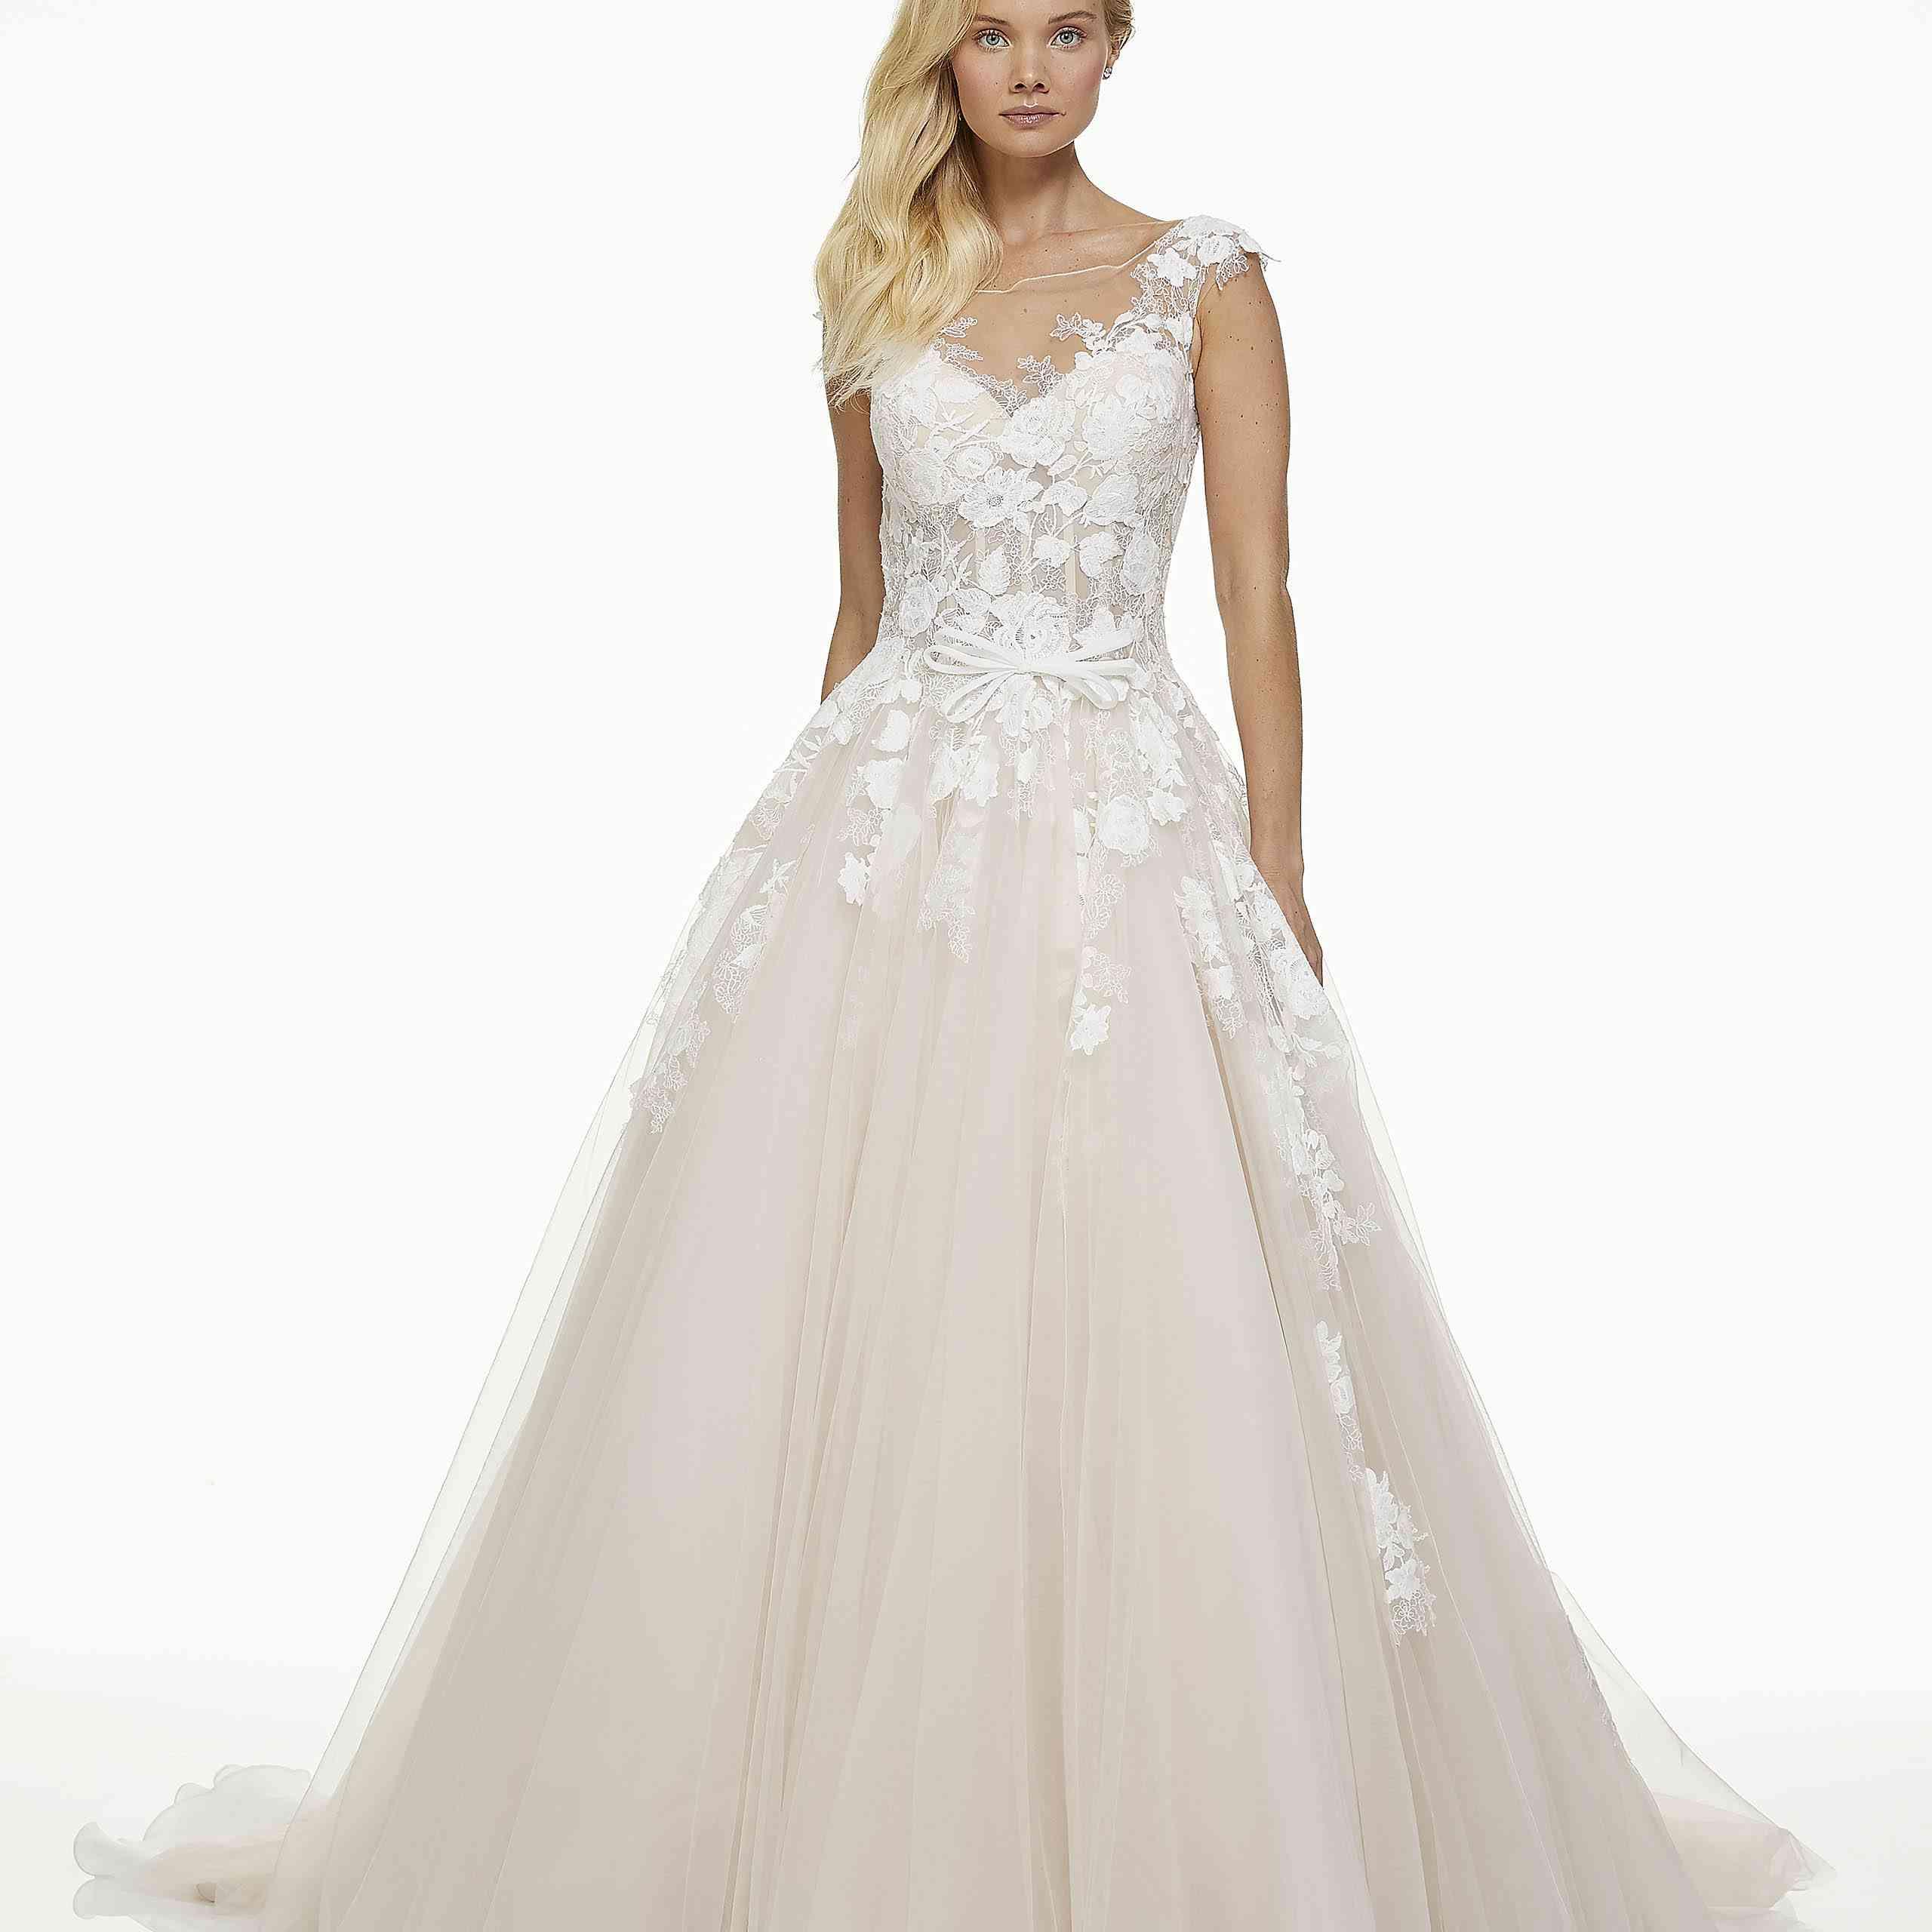 Model in bateau neckline lace wedding ball gown